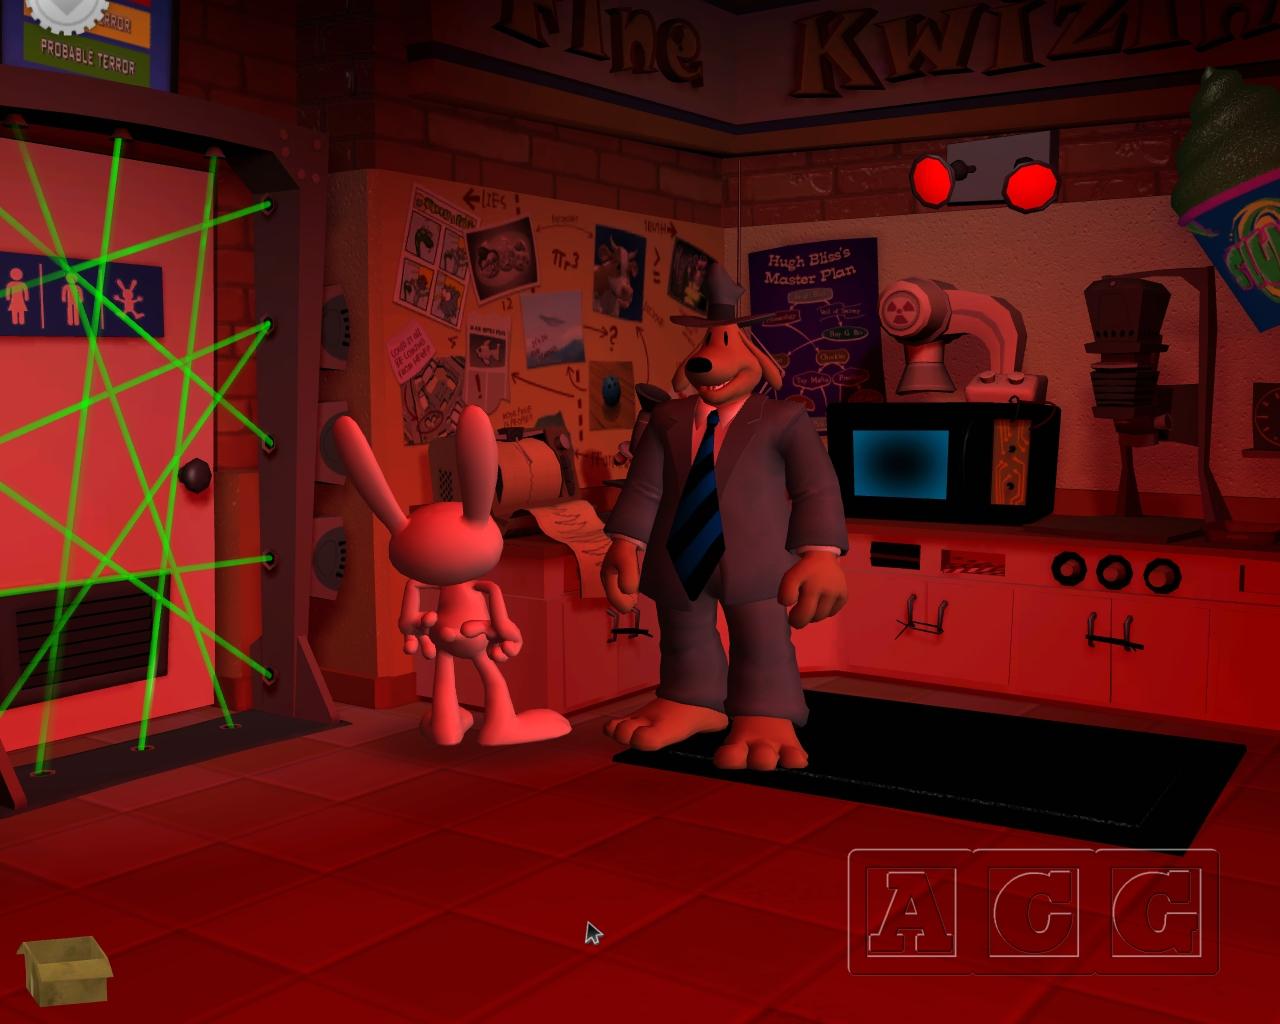 Sam & Max Beyond Time & Space Episode 201: Ice Station Santa